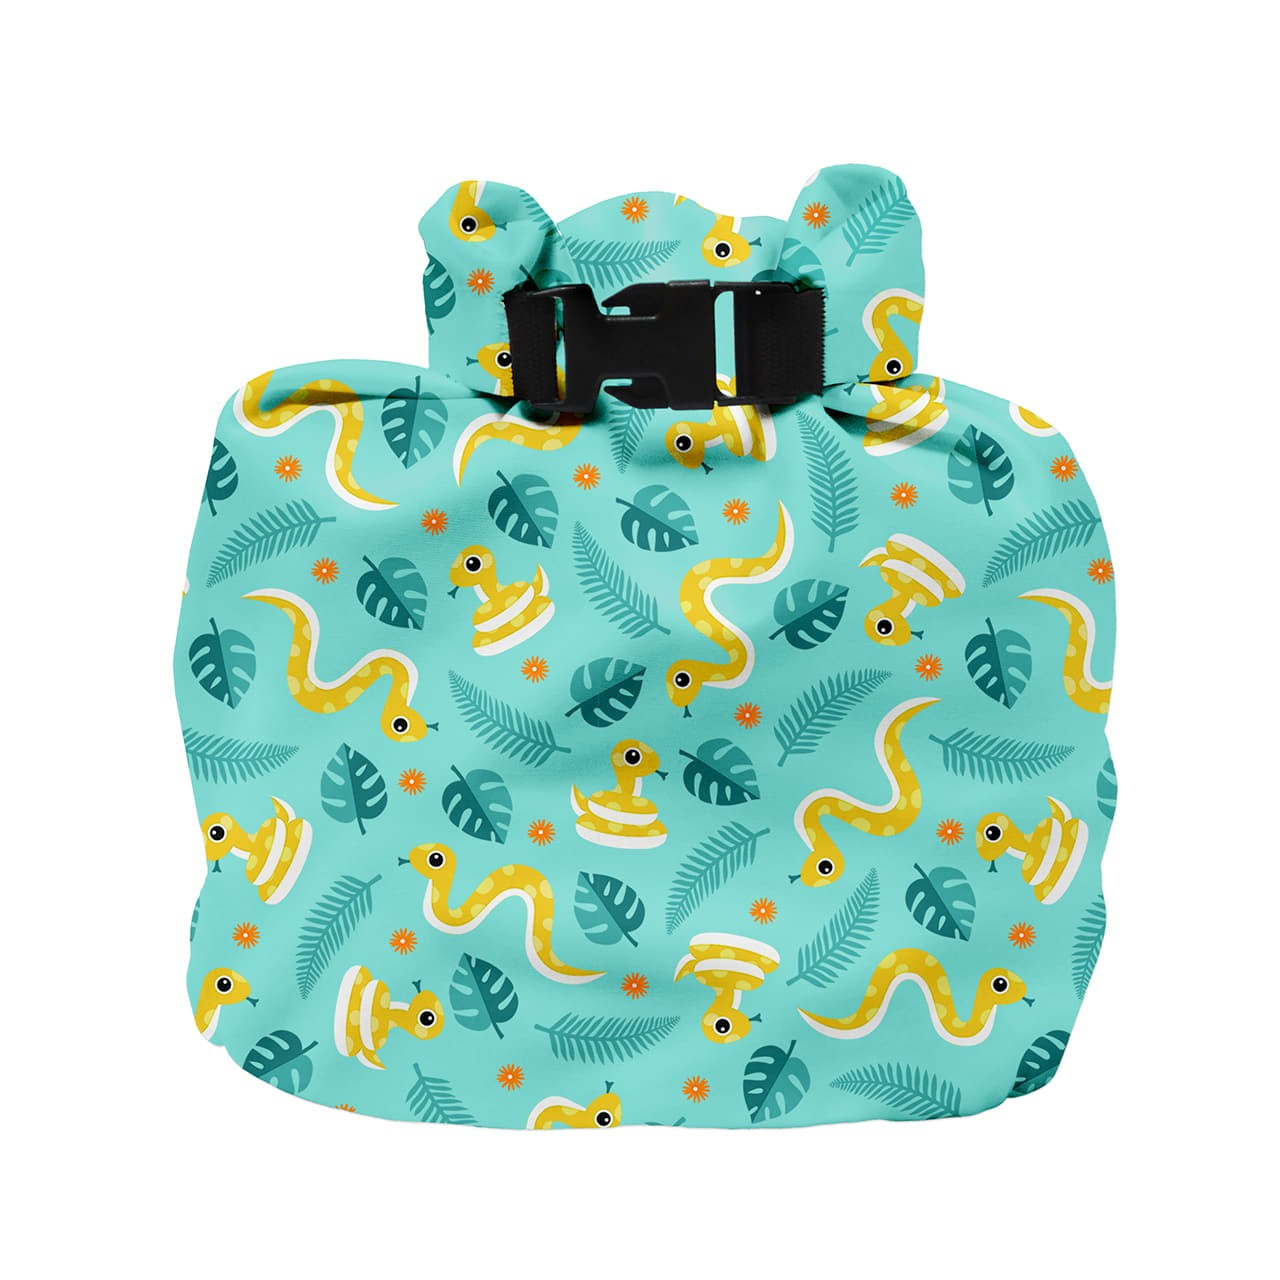 sac de stockage couches lavables-bambino mio- serpent